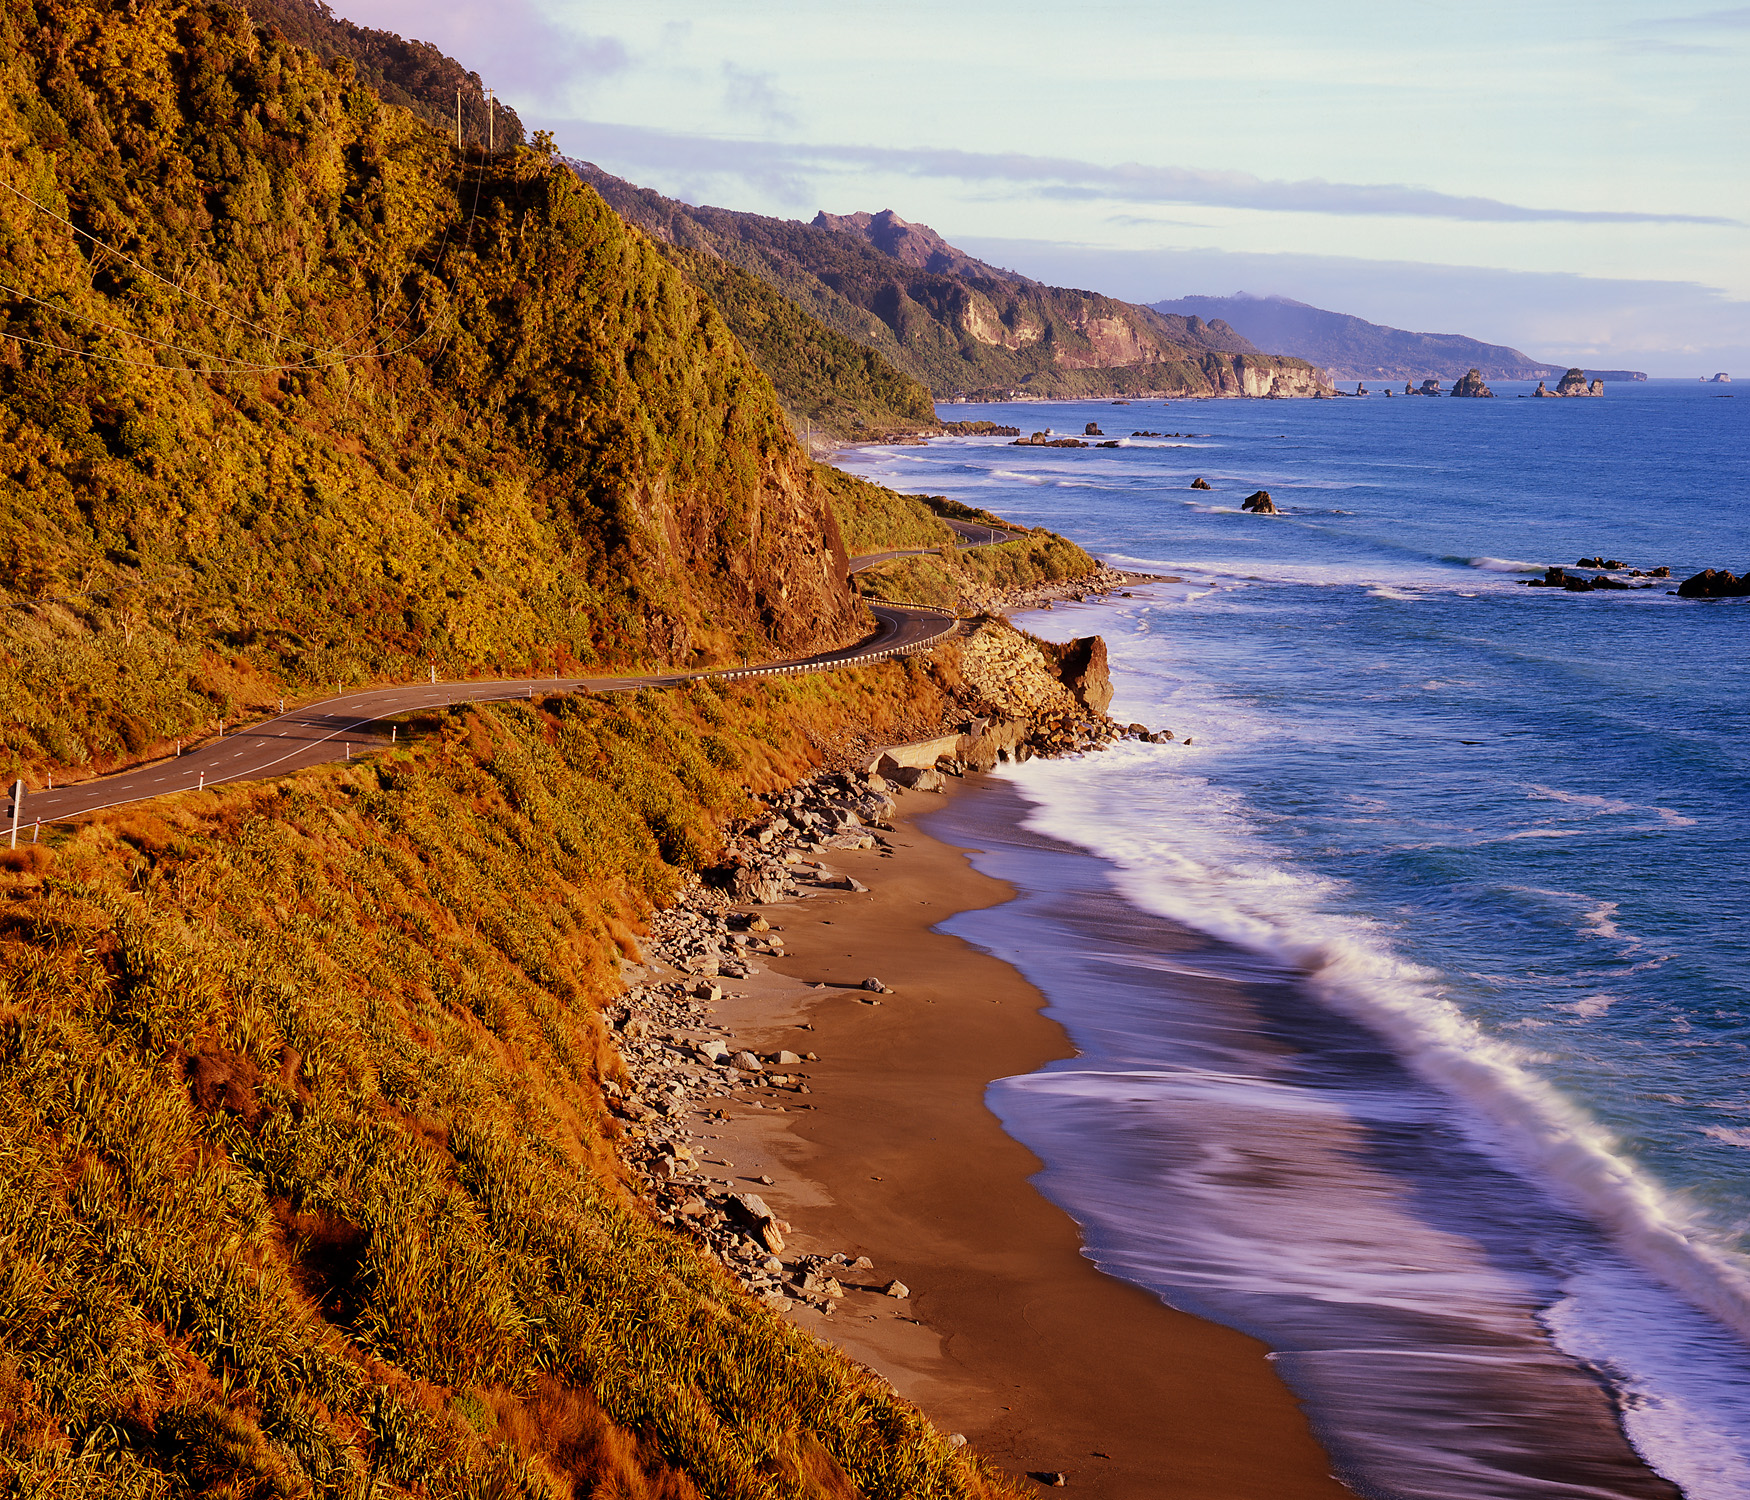 West Coast Road, where the Paparoa Mtn Range meets the Tasman Sea